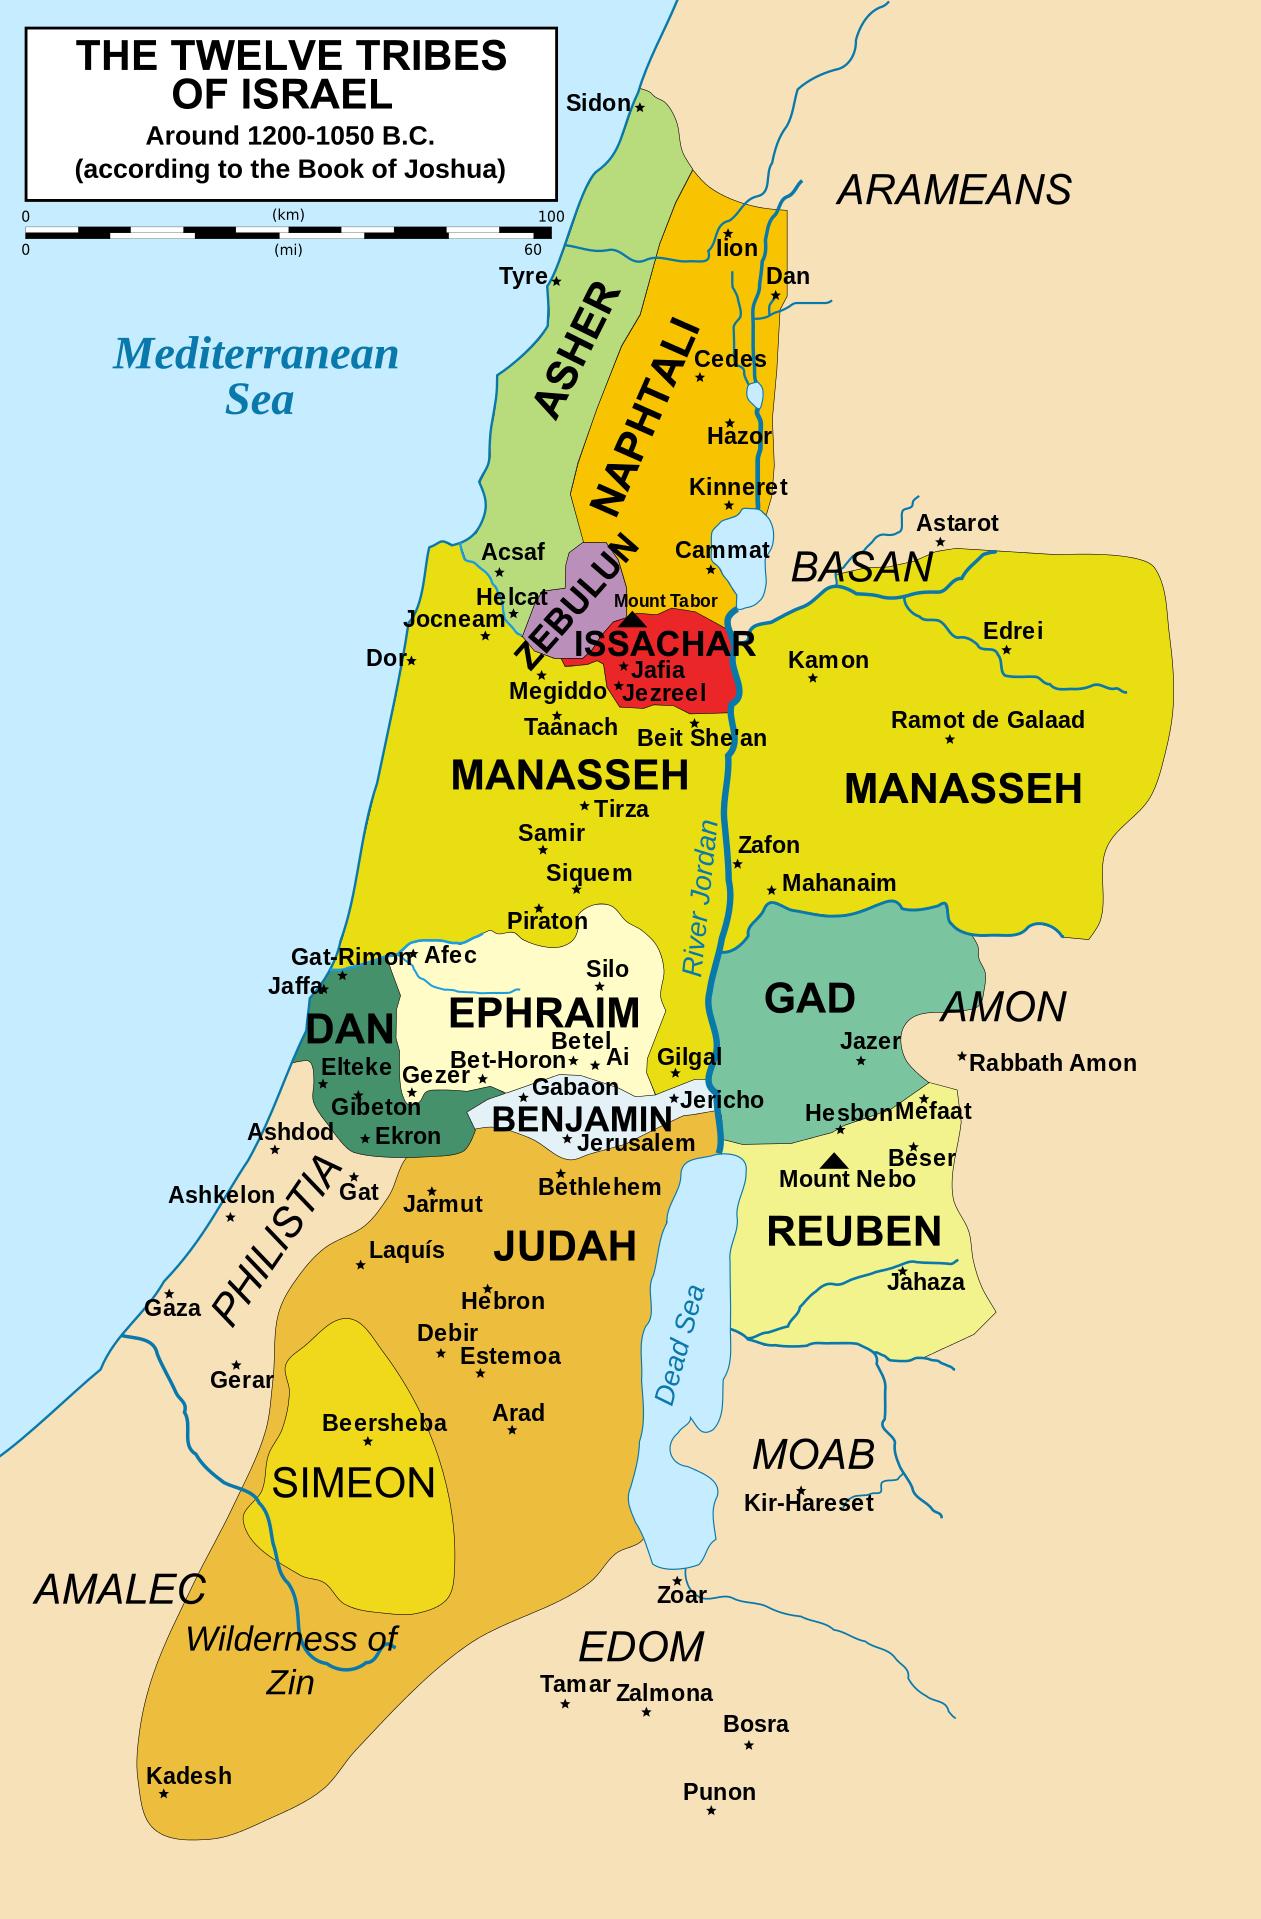 israel mapa MusicArt DOCE TRIBUS DE ISRAEL Mapa con las doce tribus israelitas  israel mapa